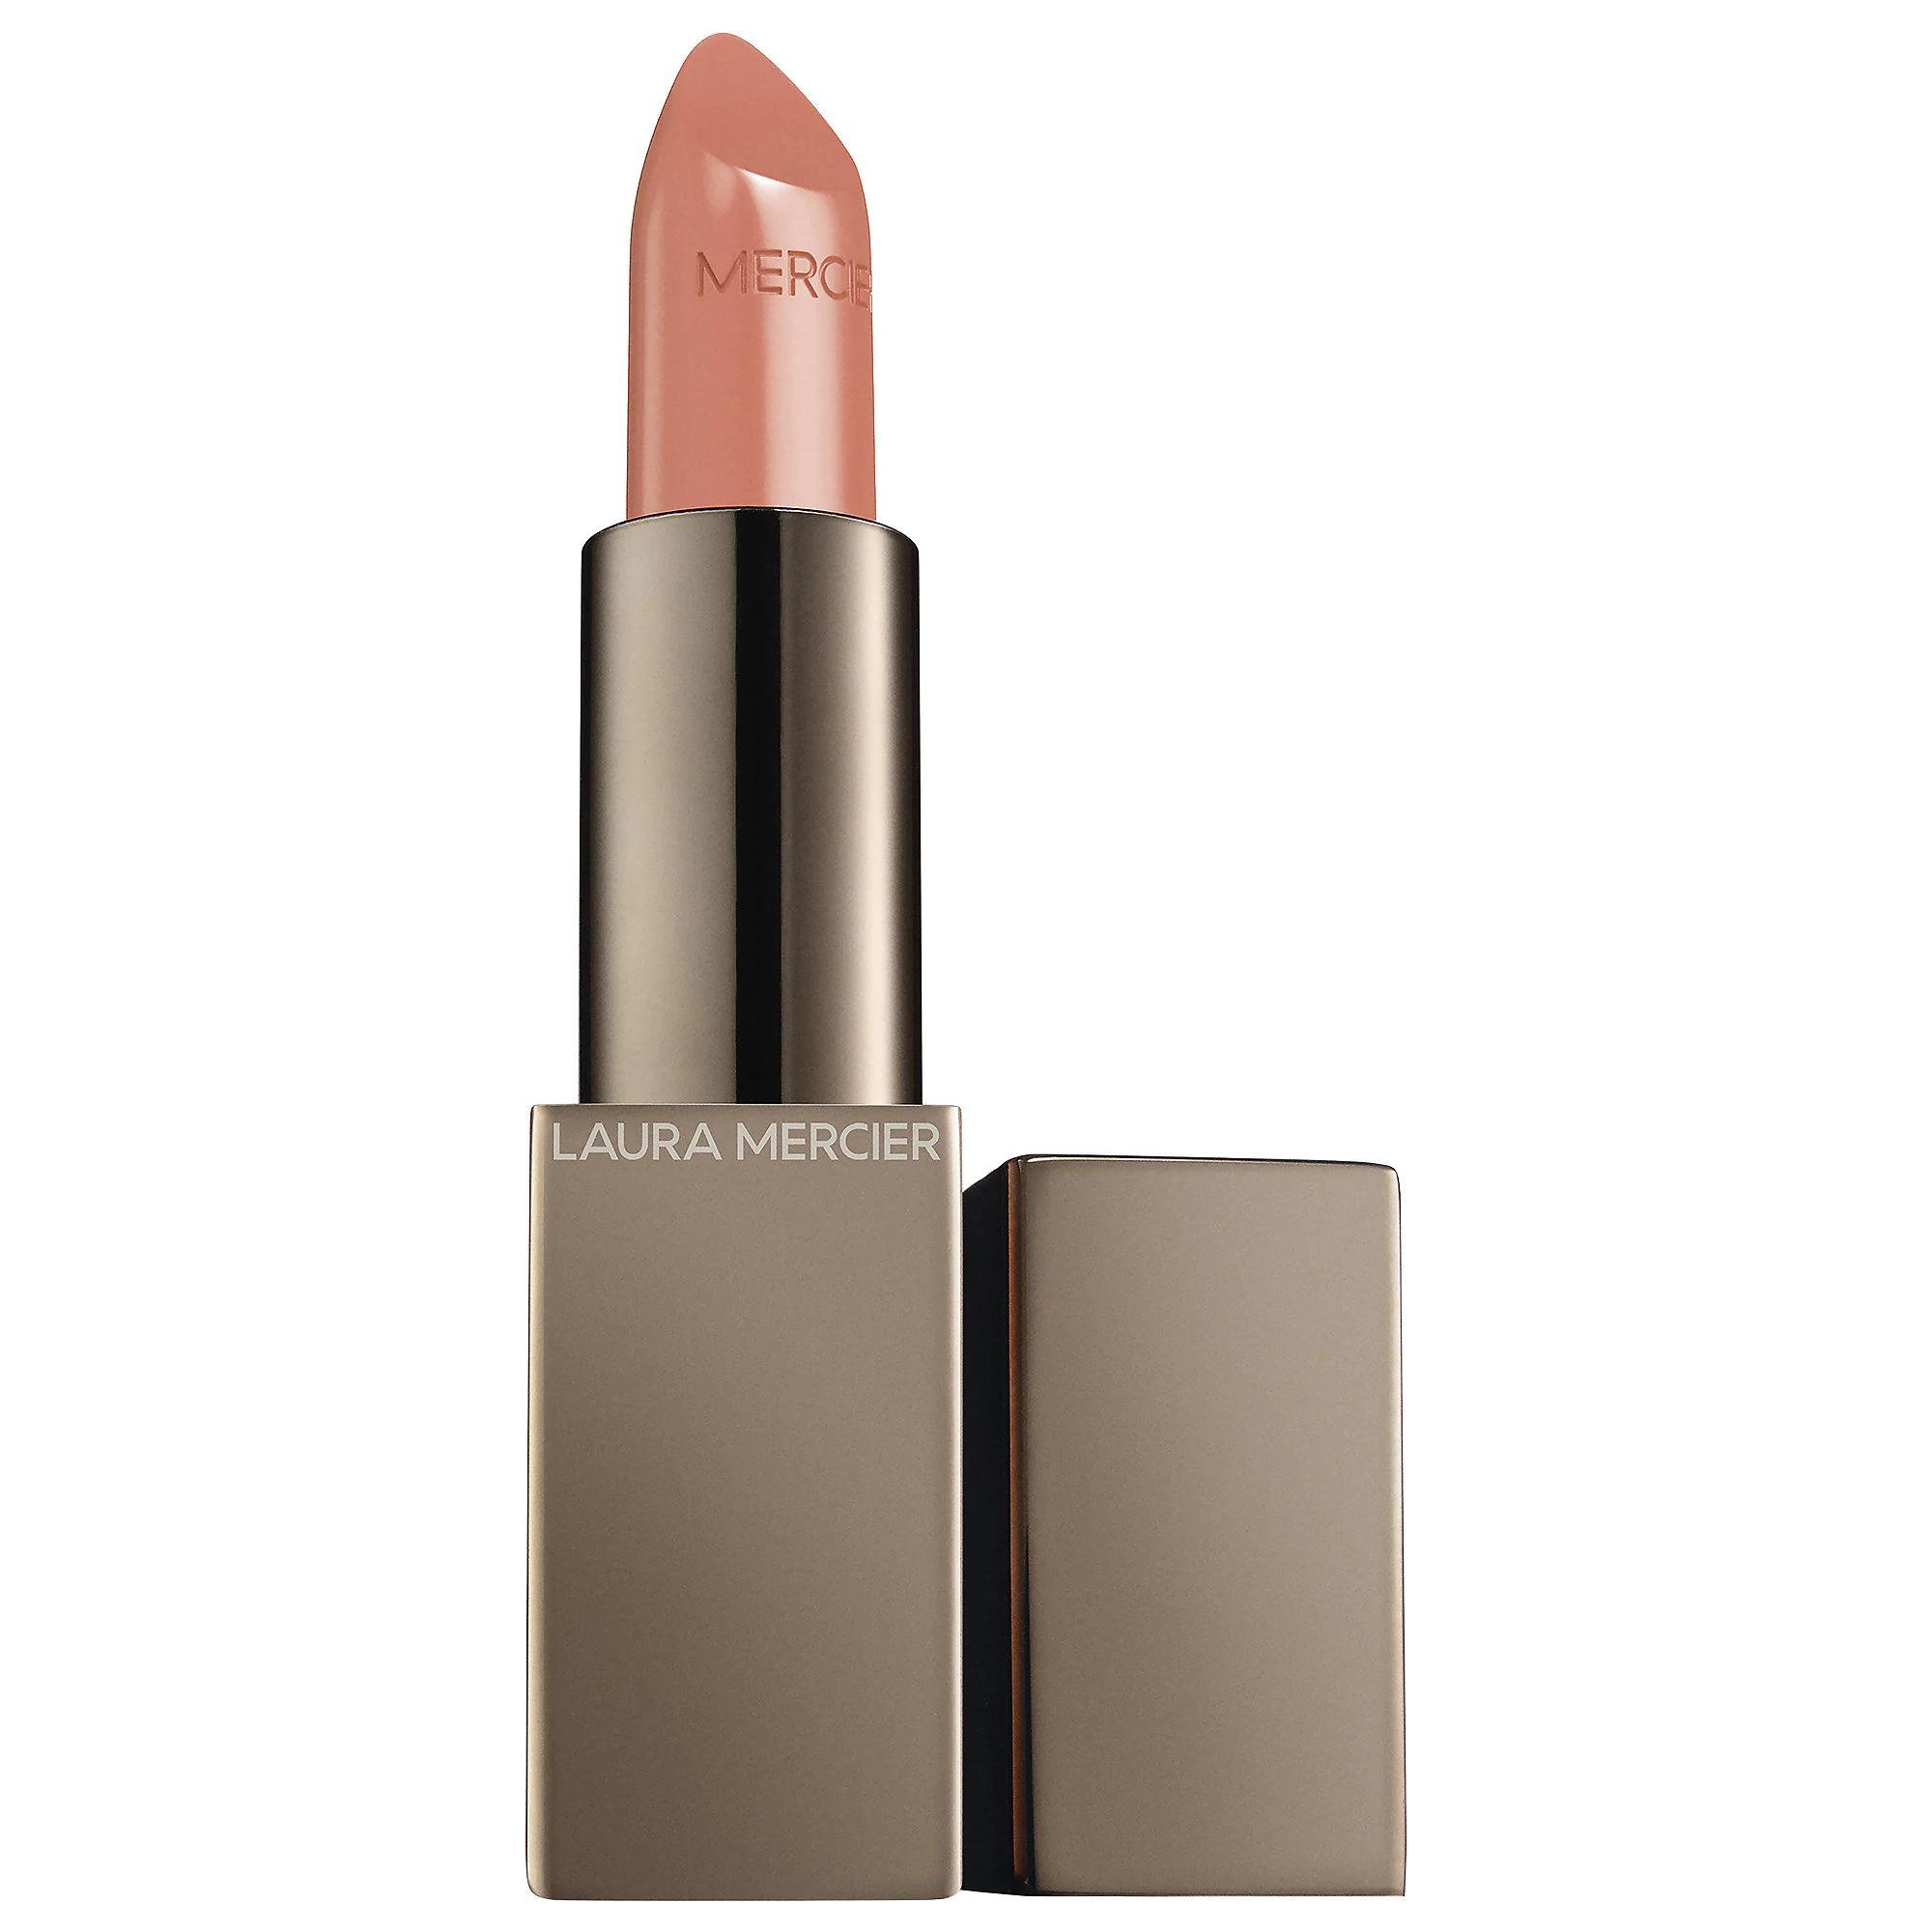 Laura Mercier Rouge Essentiel Silky Creme Lipstick Coral Nu